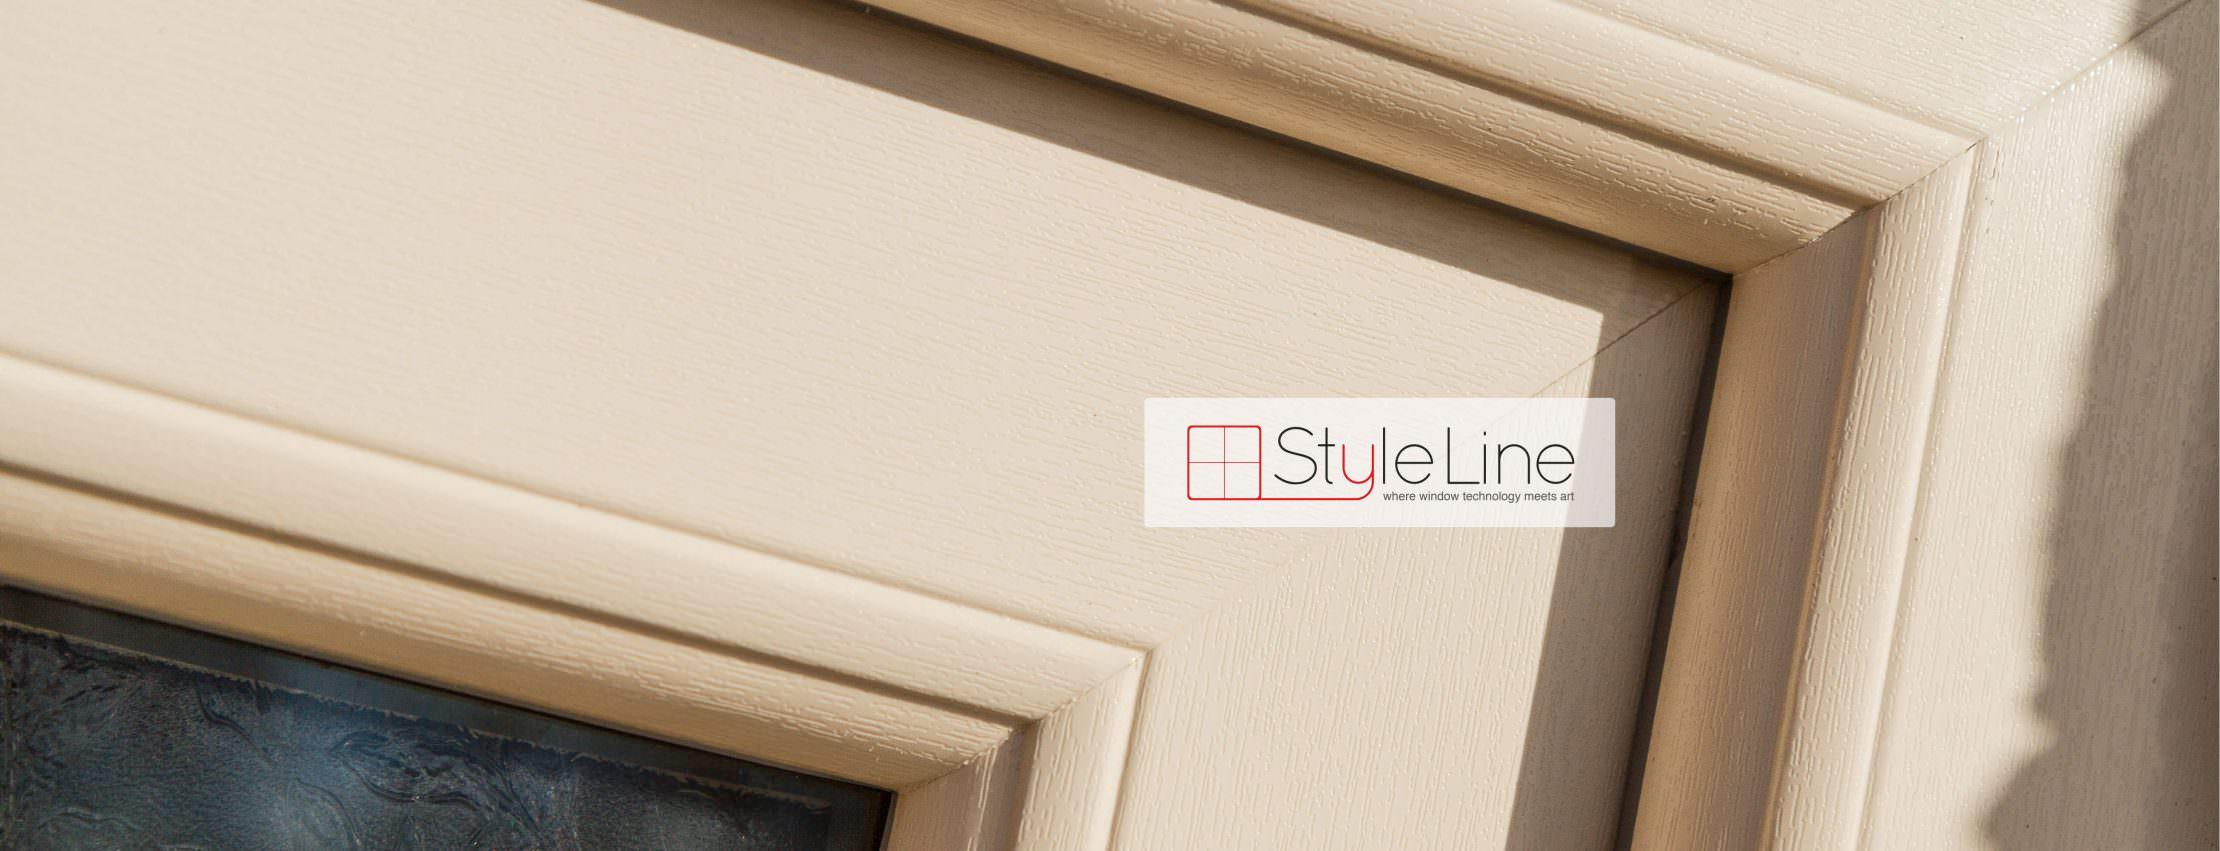 styleline-21